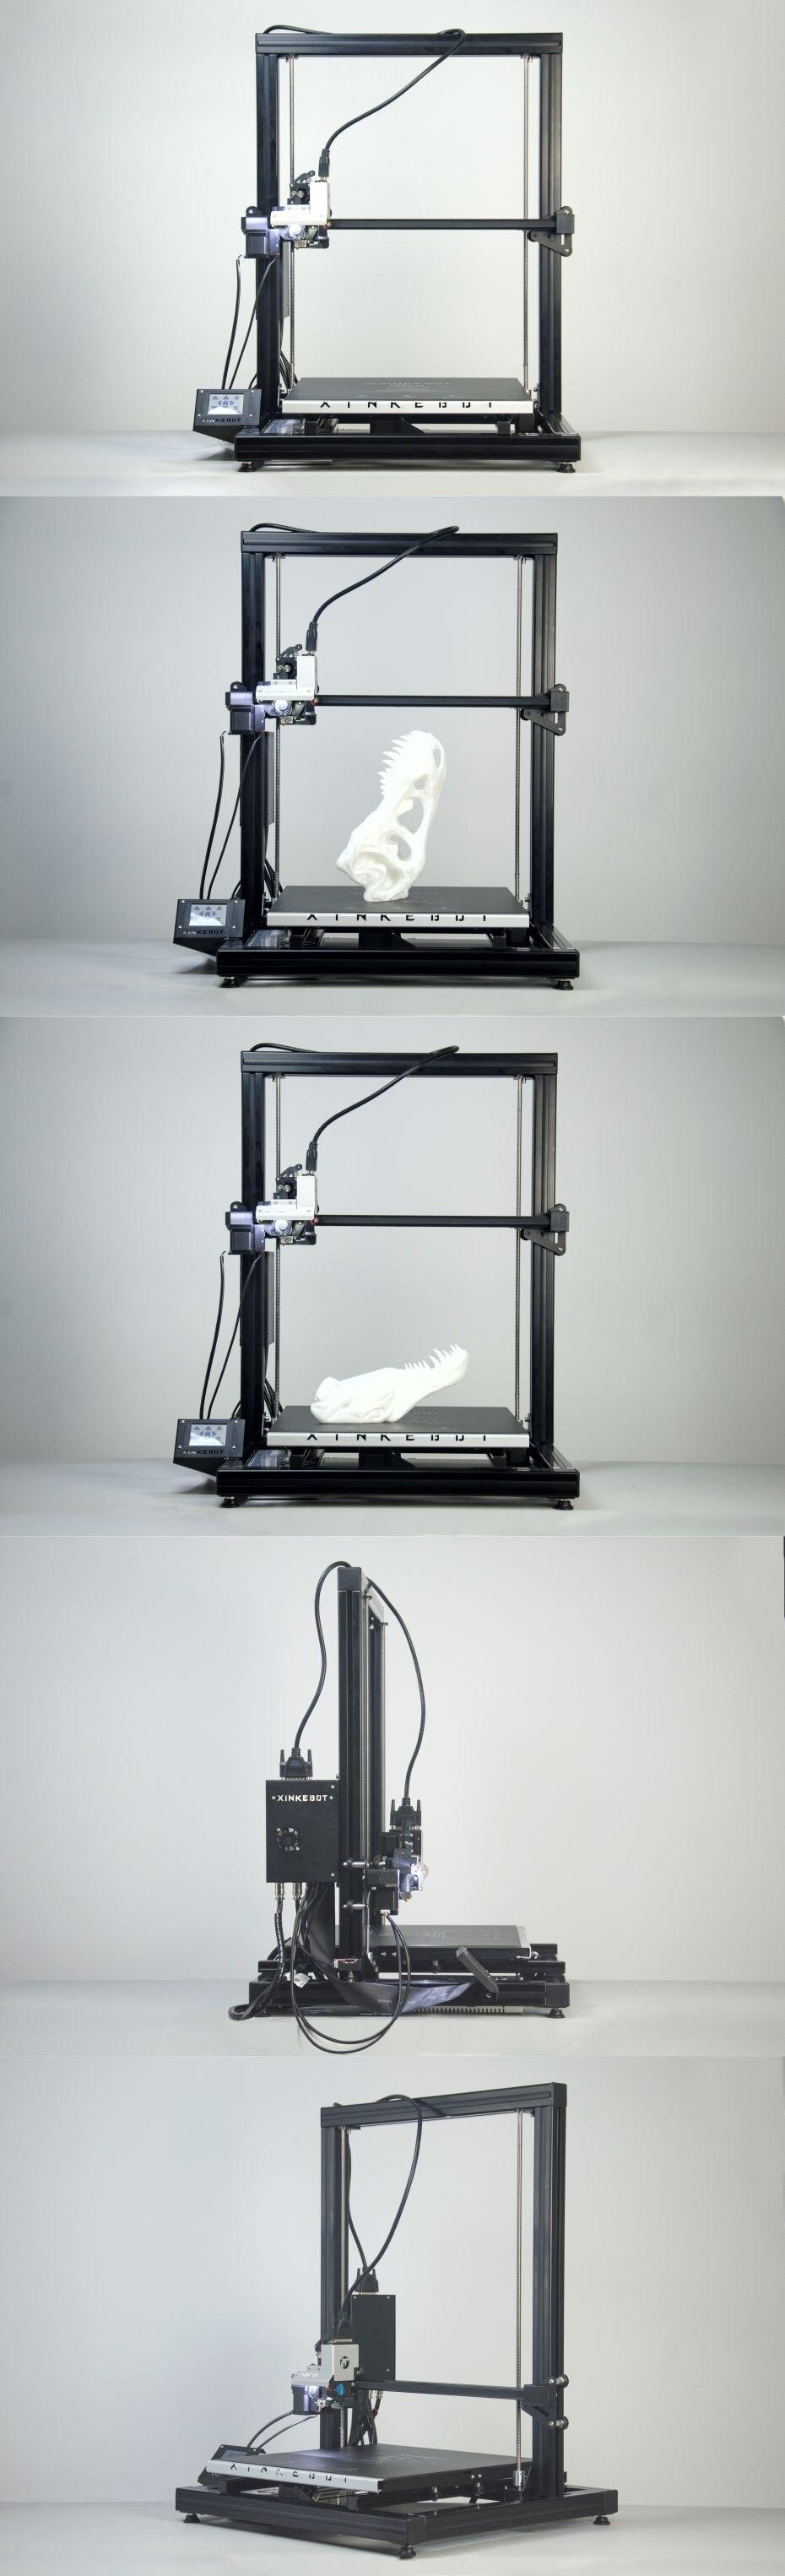 Large 3D Printer DIY Kit High Precision 3D Printer 0.05 Resolution Xinkebot Orca2 Cygnus 400*400*500 Print Size